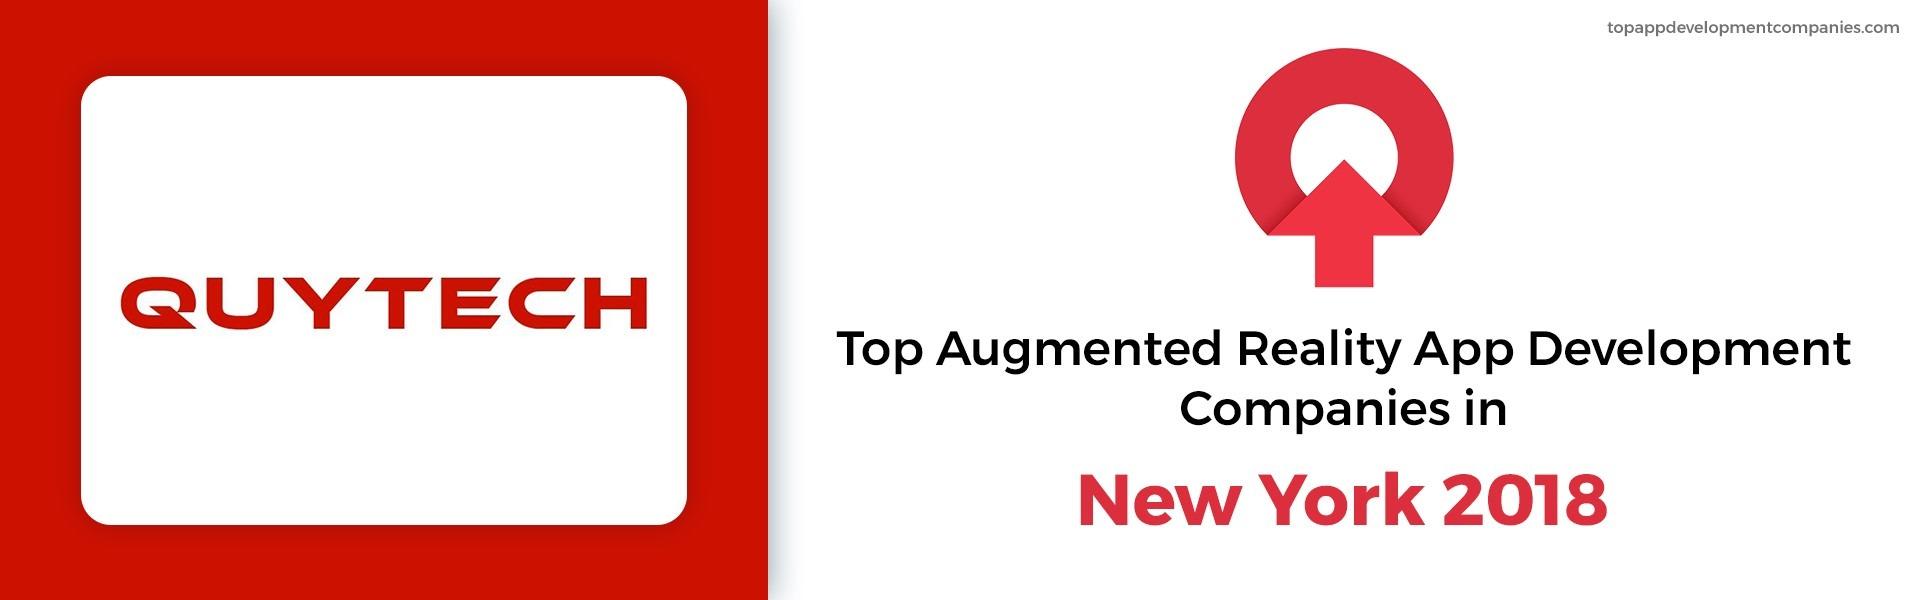 quytech ar app development company